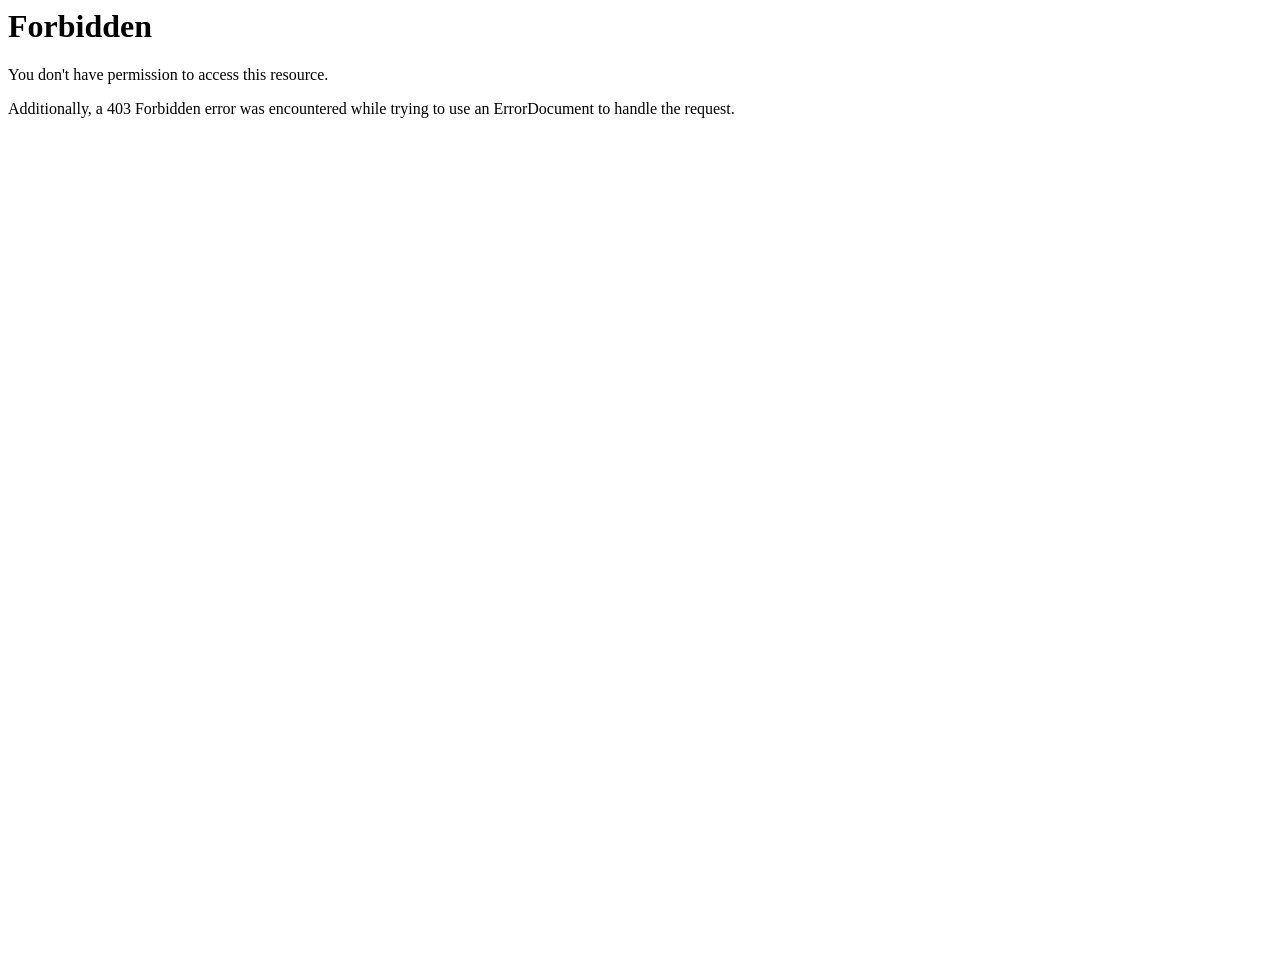 http://www.vipetur.com.br